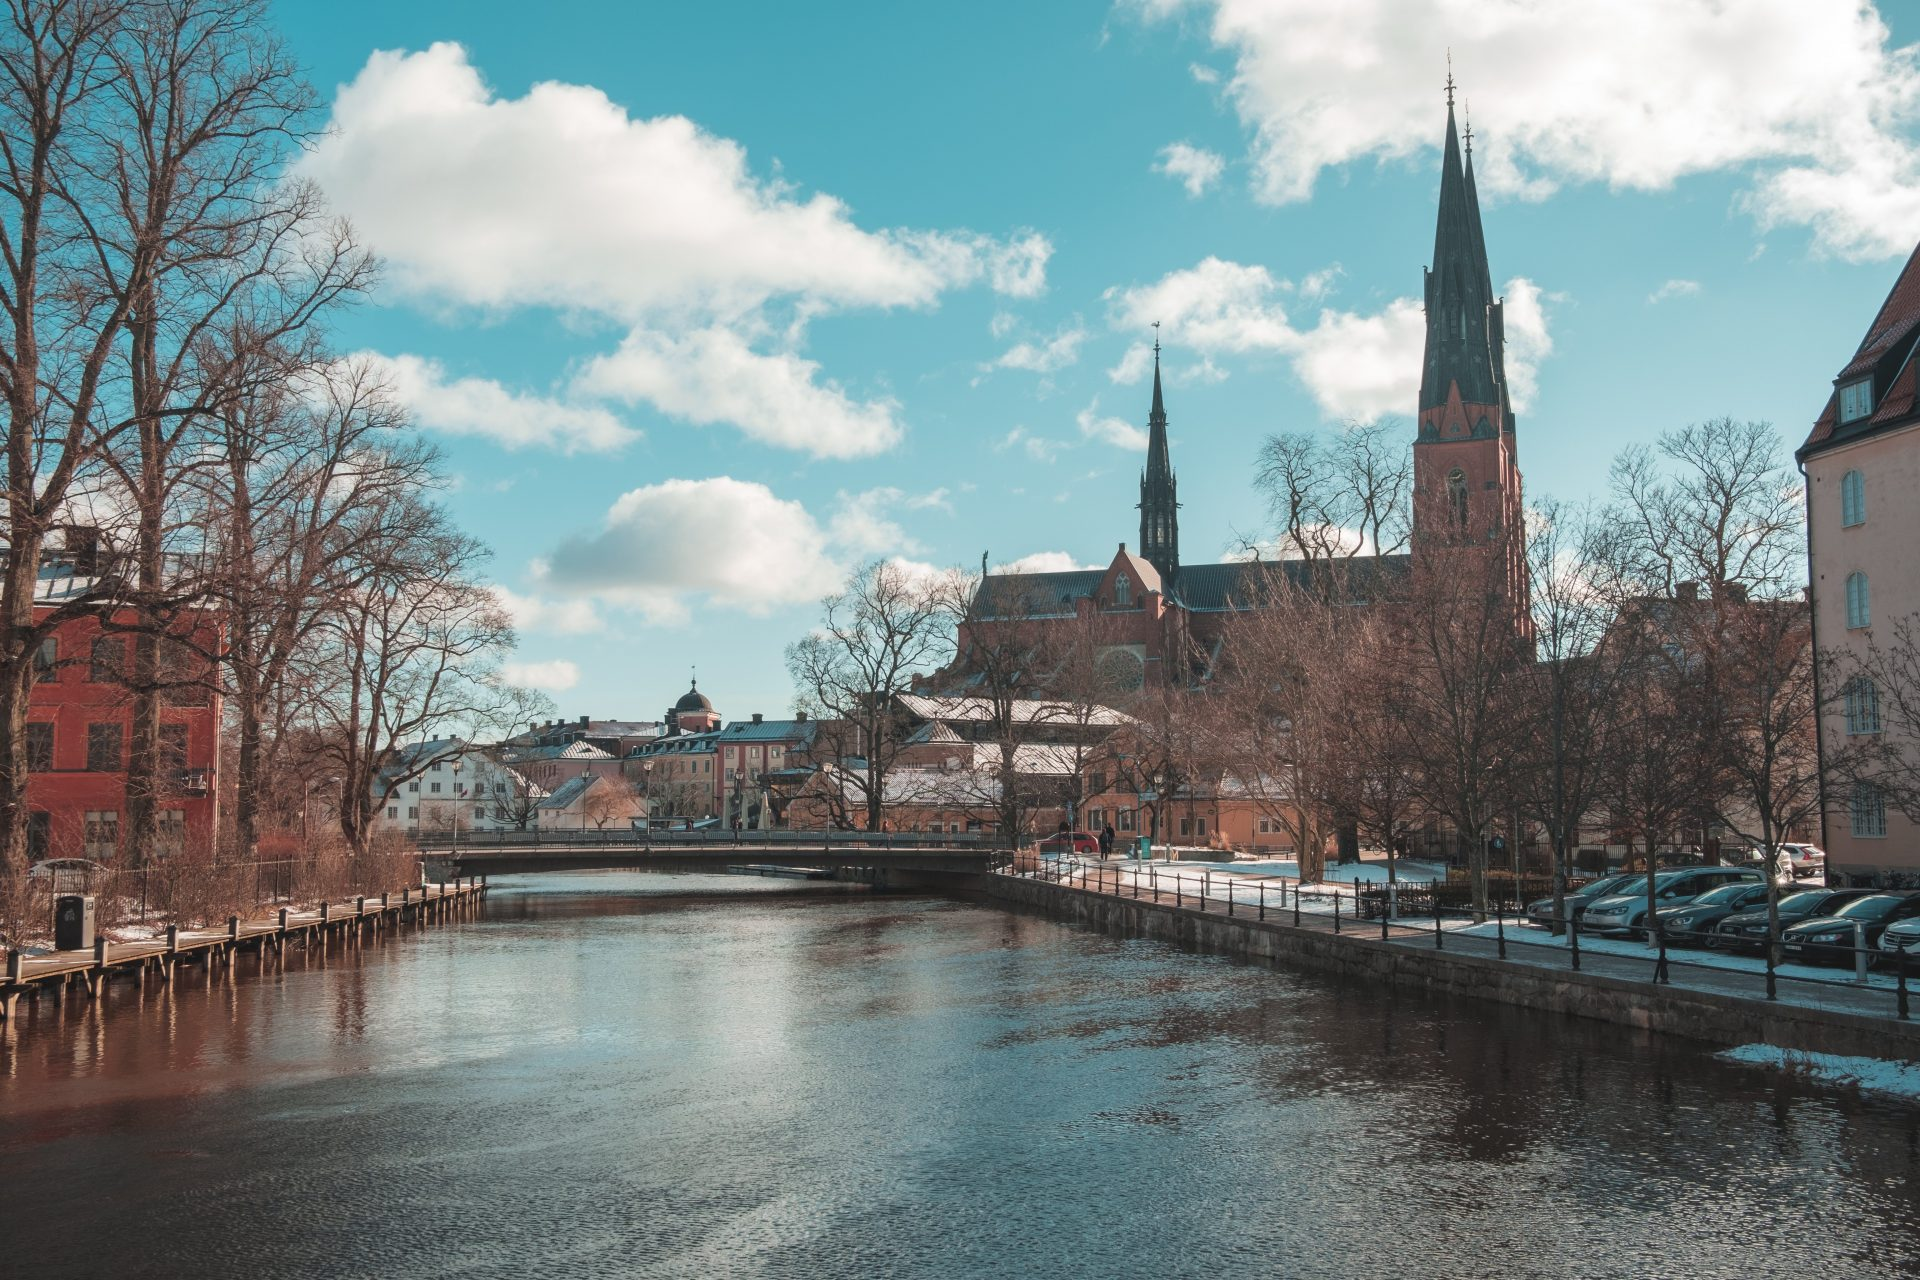 Skype intervju Švedska Sweden interview